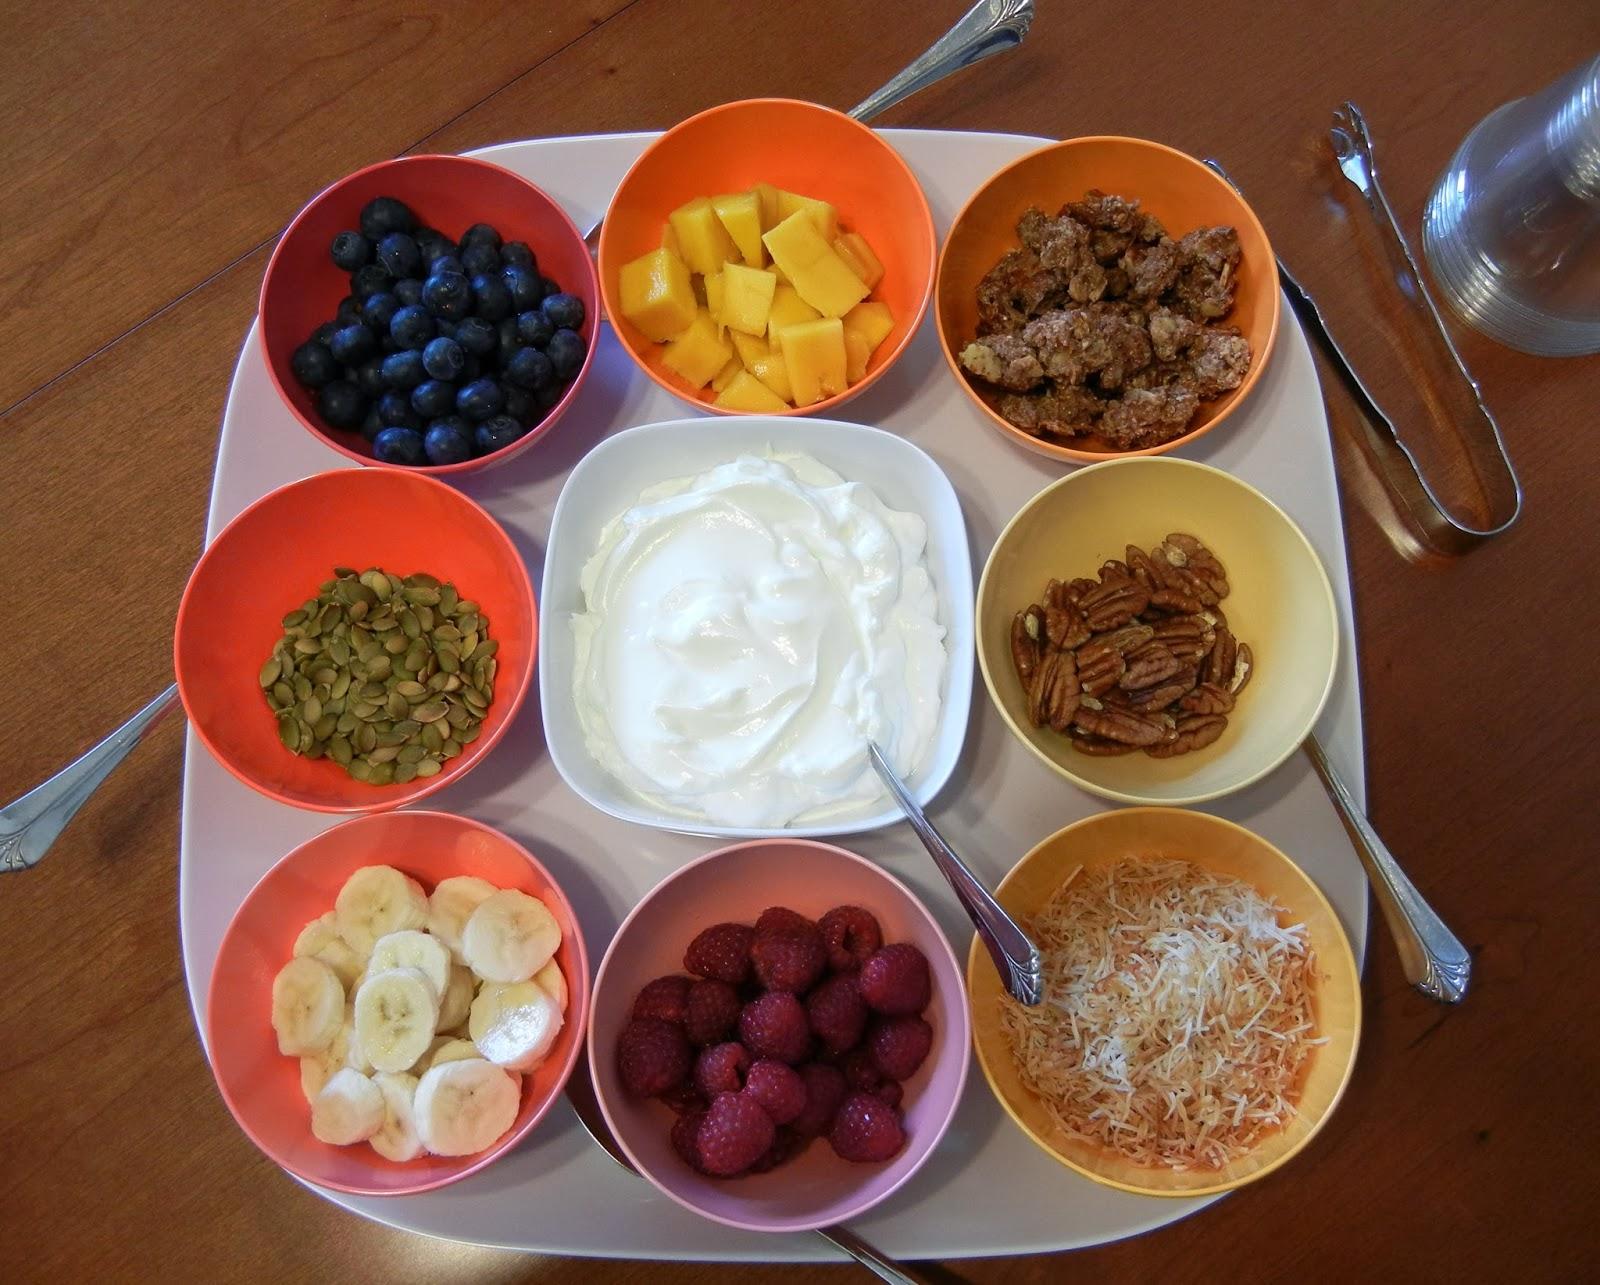 Build+your+own+healthy+yogurt+bar+brunch Weight Loss Recipes Build Your Own Yogurt Parfait Bar